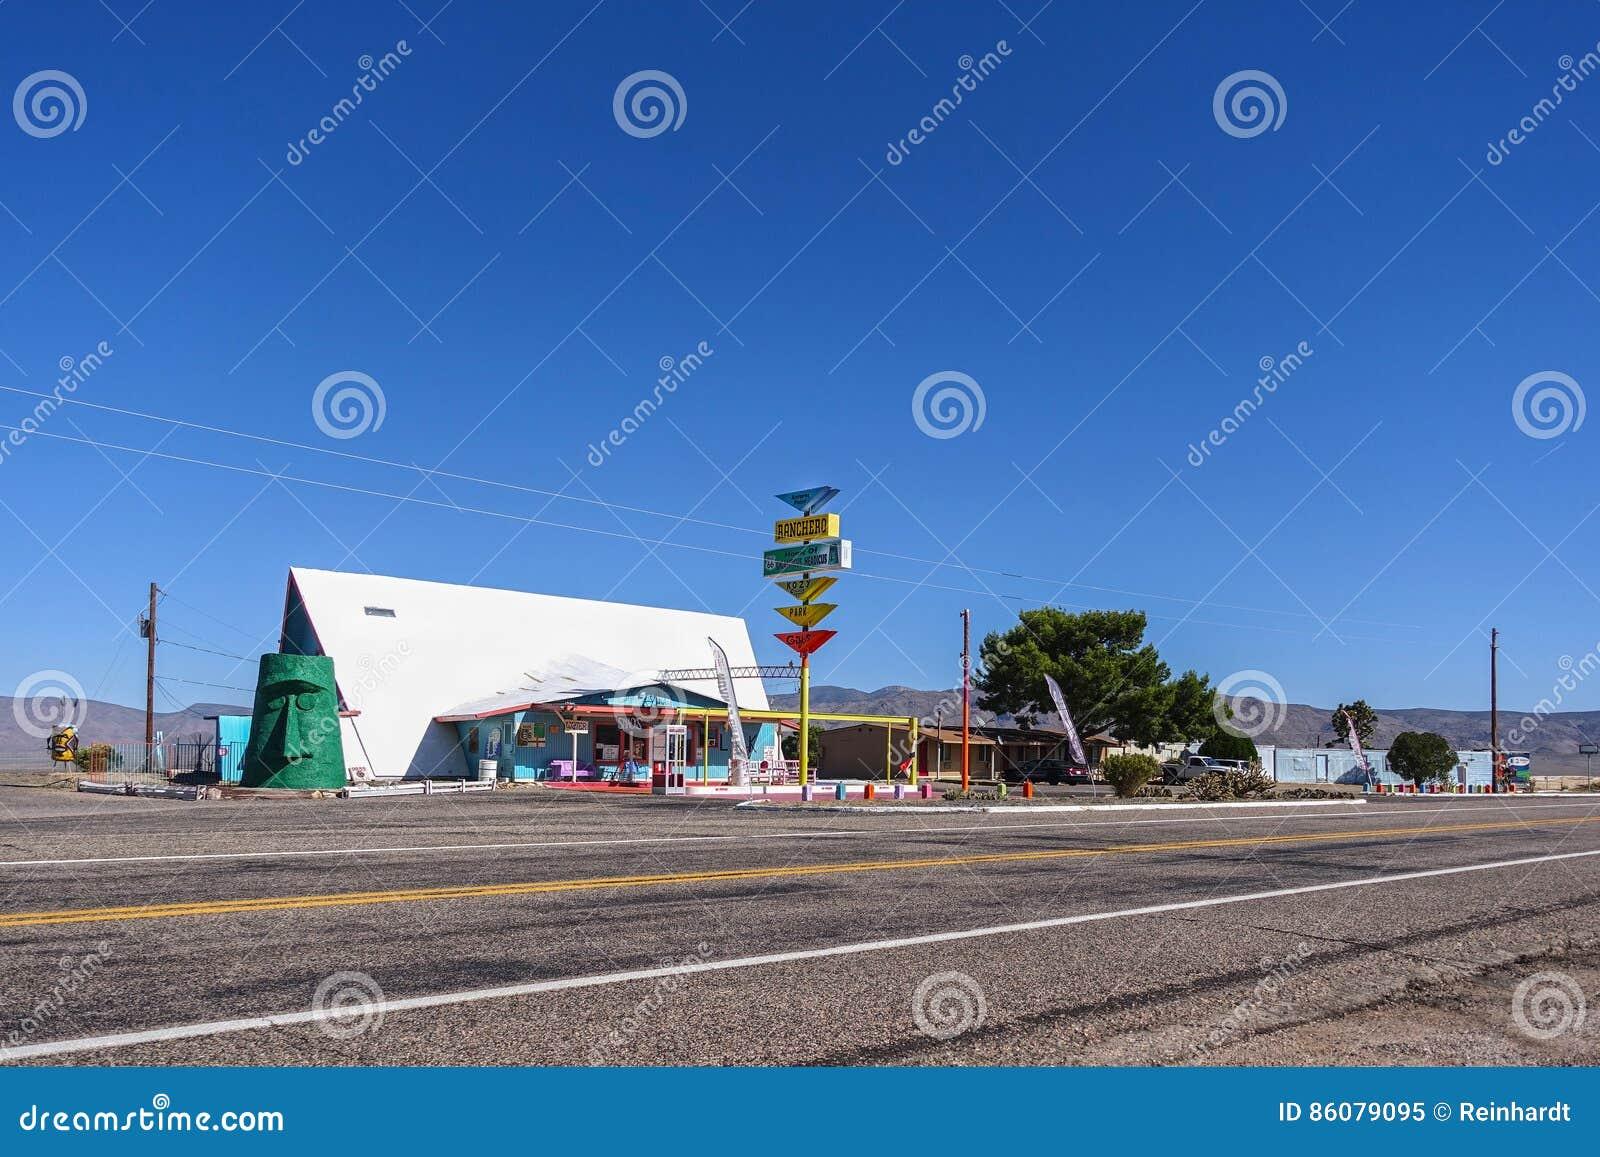 De V.S. 4233-16 Route 66, Ranchero-Motel